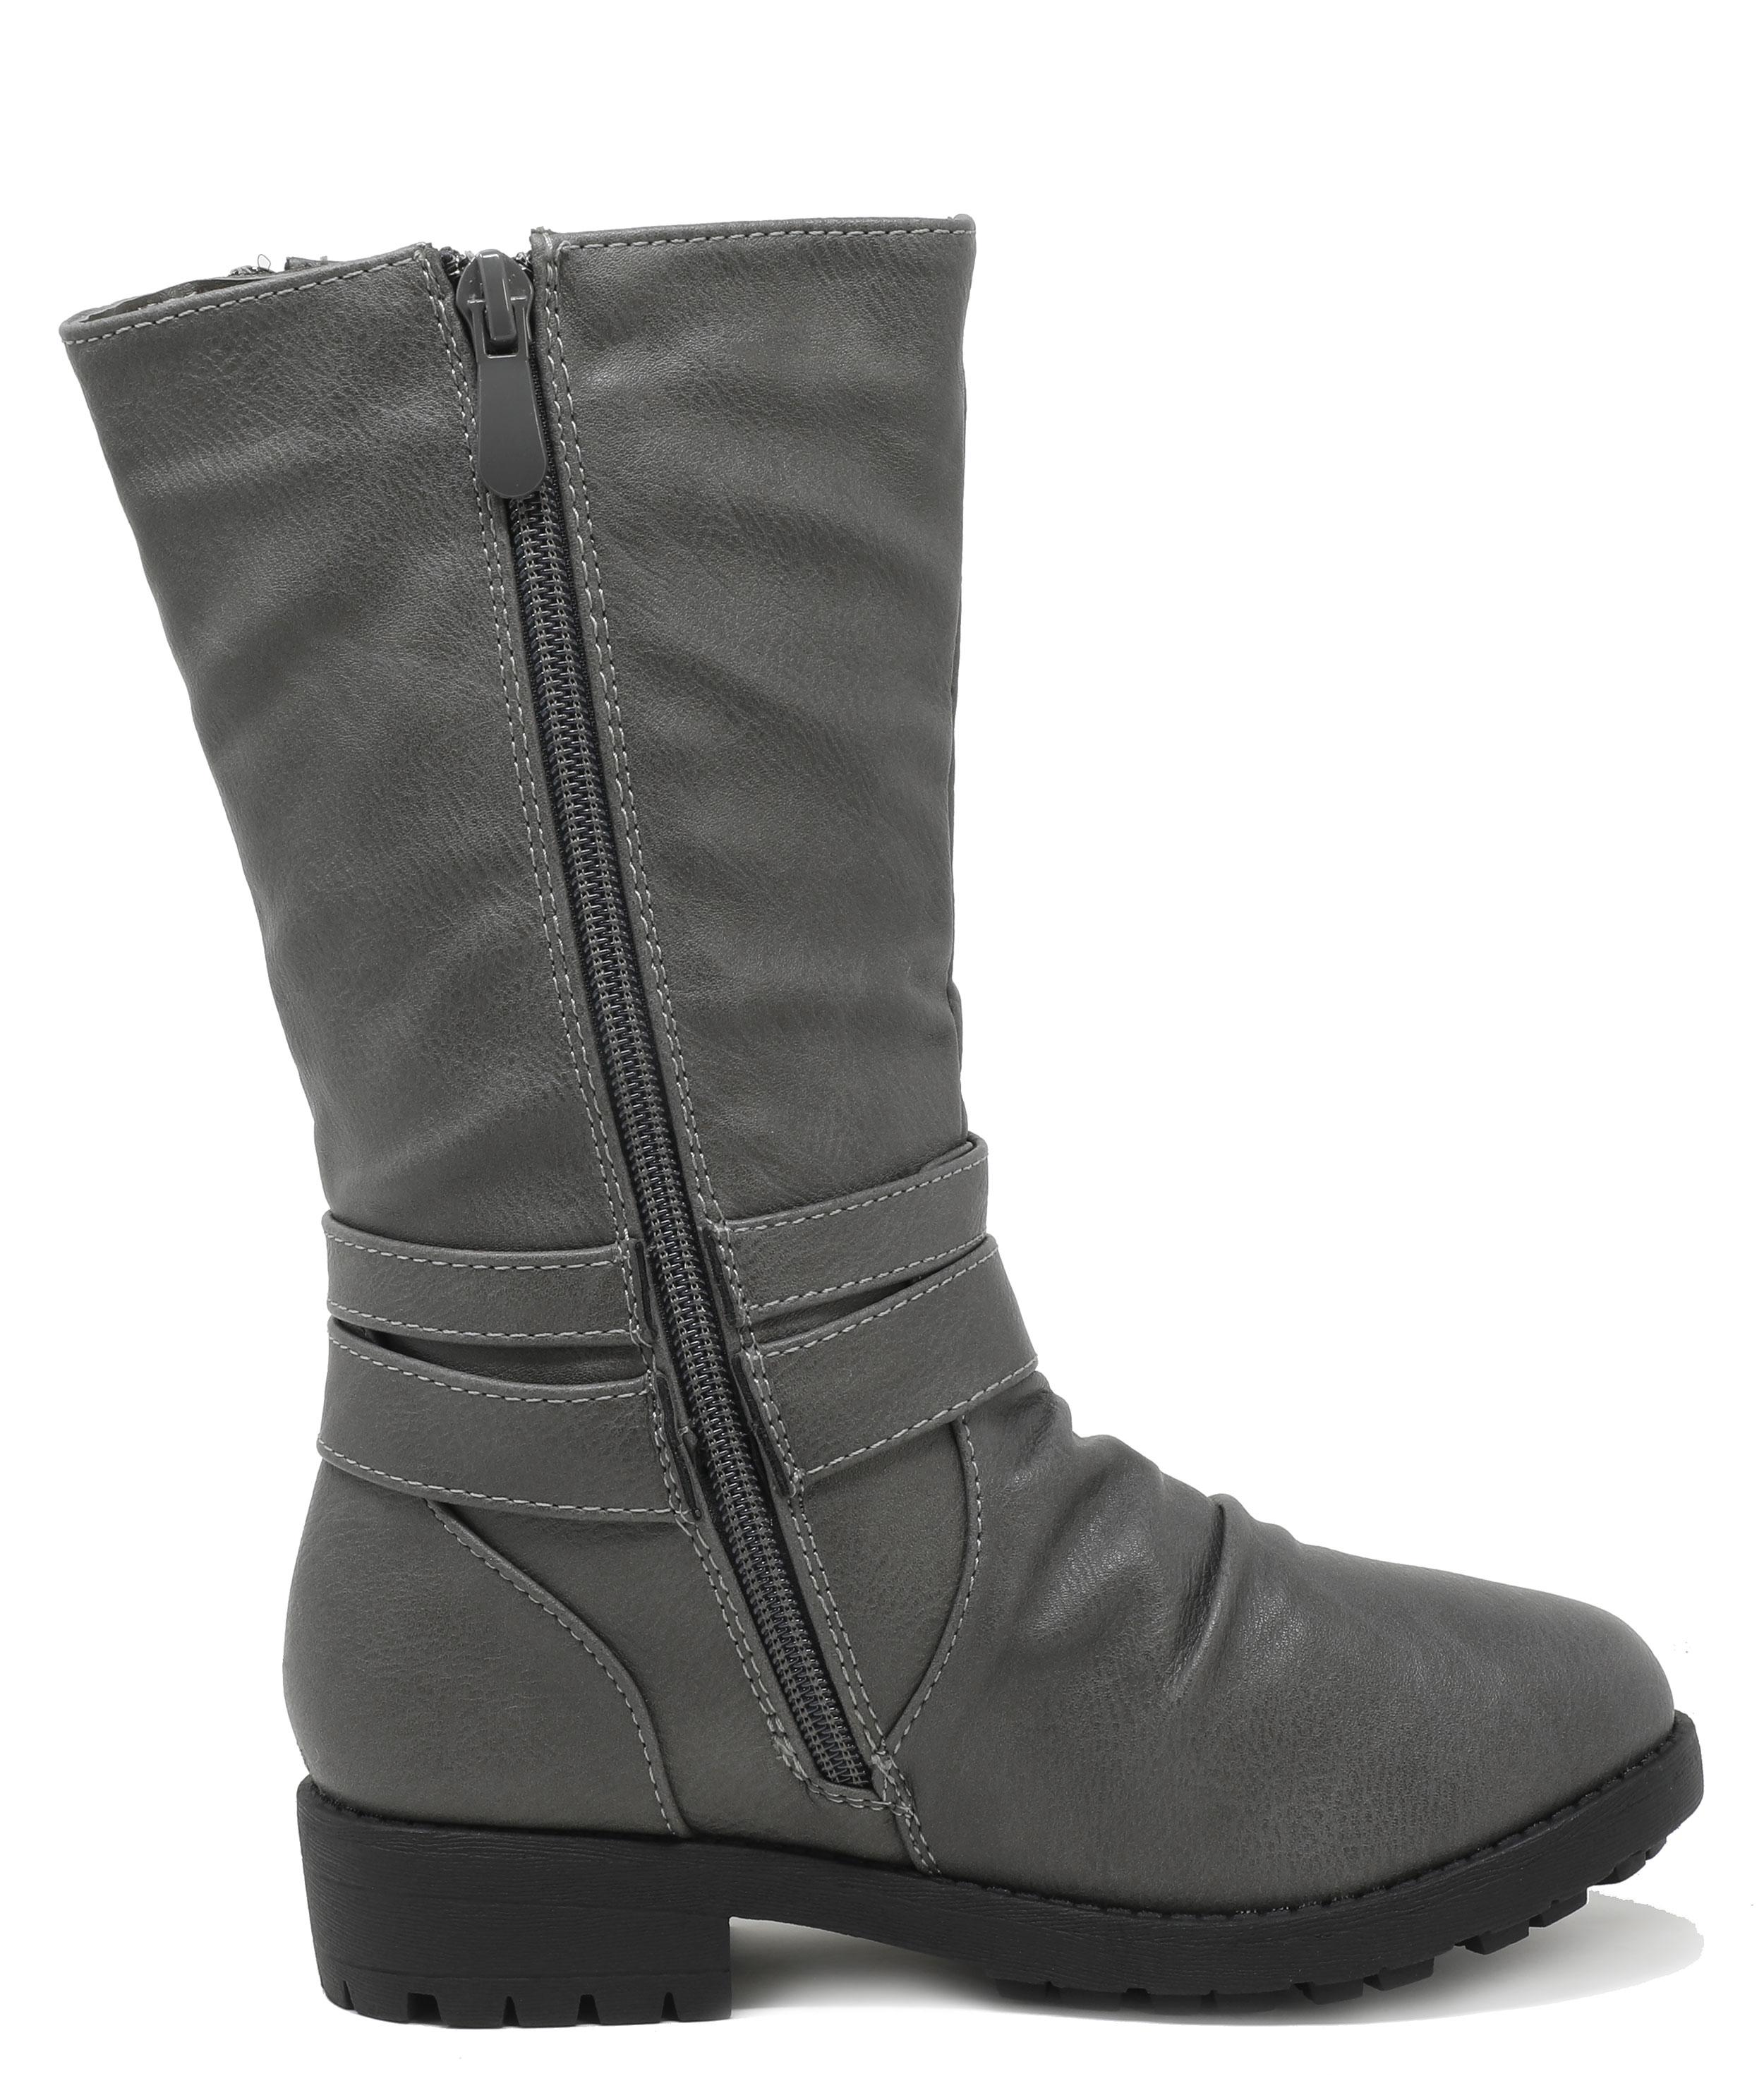 DREAM PAIRS Girls Boys ATLANTA-K Toddler//Kid New Knee High Mid Calf Winter Boots